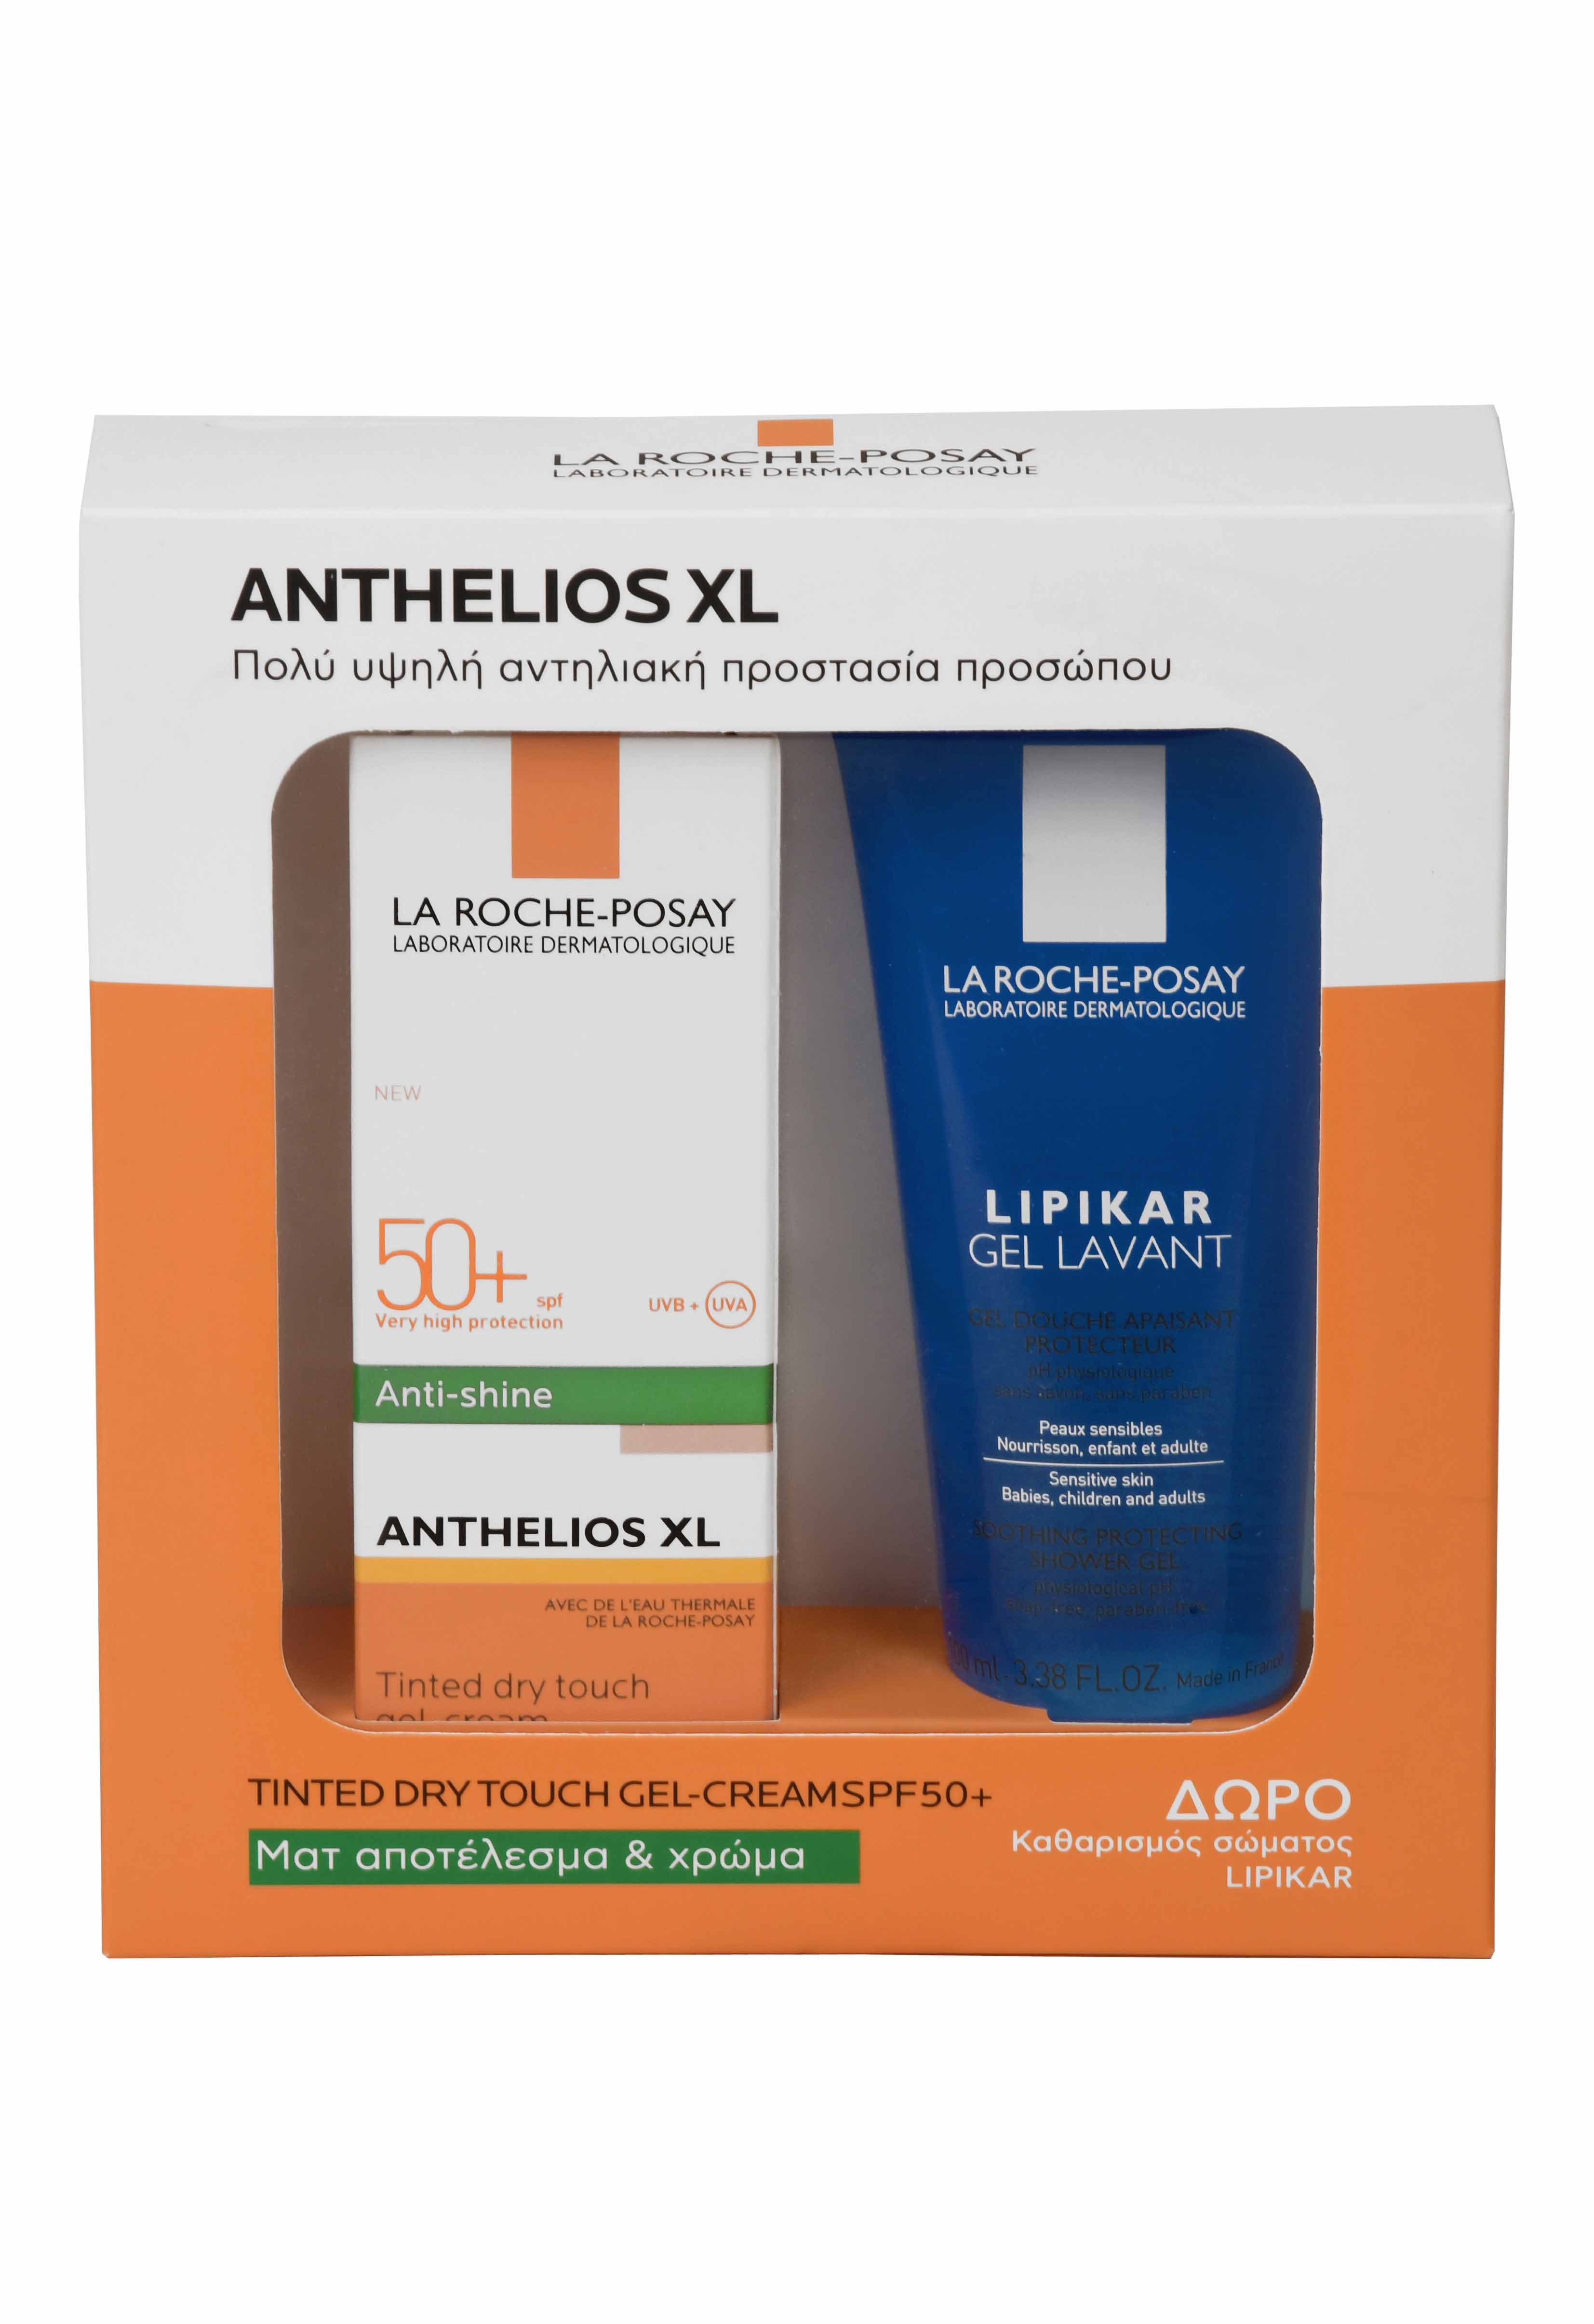 La Roche Posay Anthelios XL Anti-brillance Tinted SPF50+ Αντηλιακή Gel Κρέμα Προσώπου με Χρώμα για Ματ Αποτέλεσμα, 50ml & ΔΩΡΟ Lipikar Gel Lavant Απαλός Καθαρισμός Σώματος, 100ml